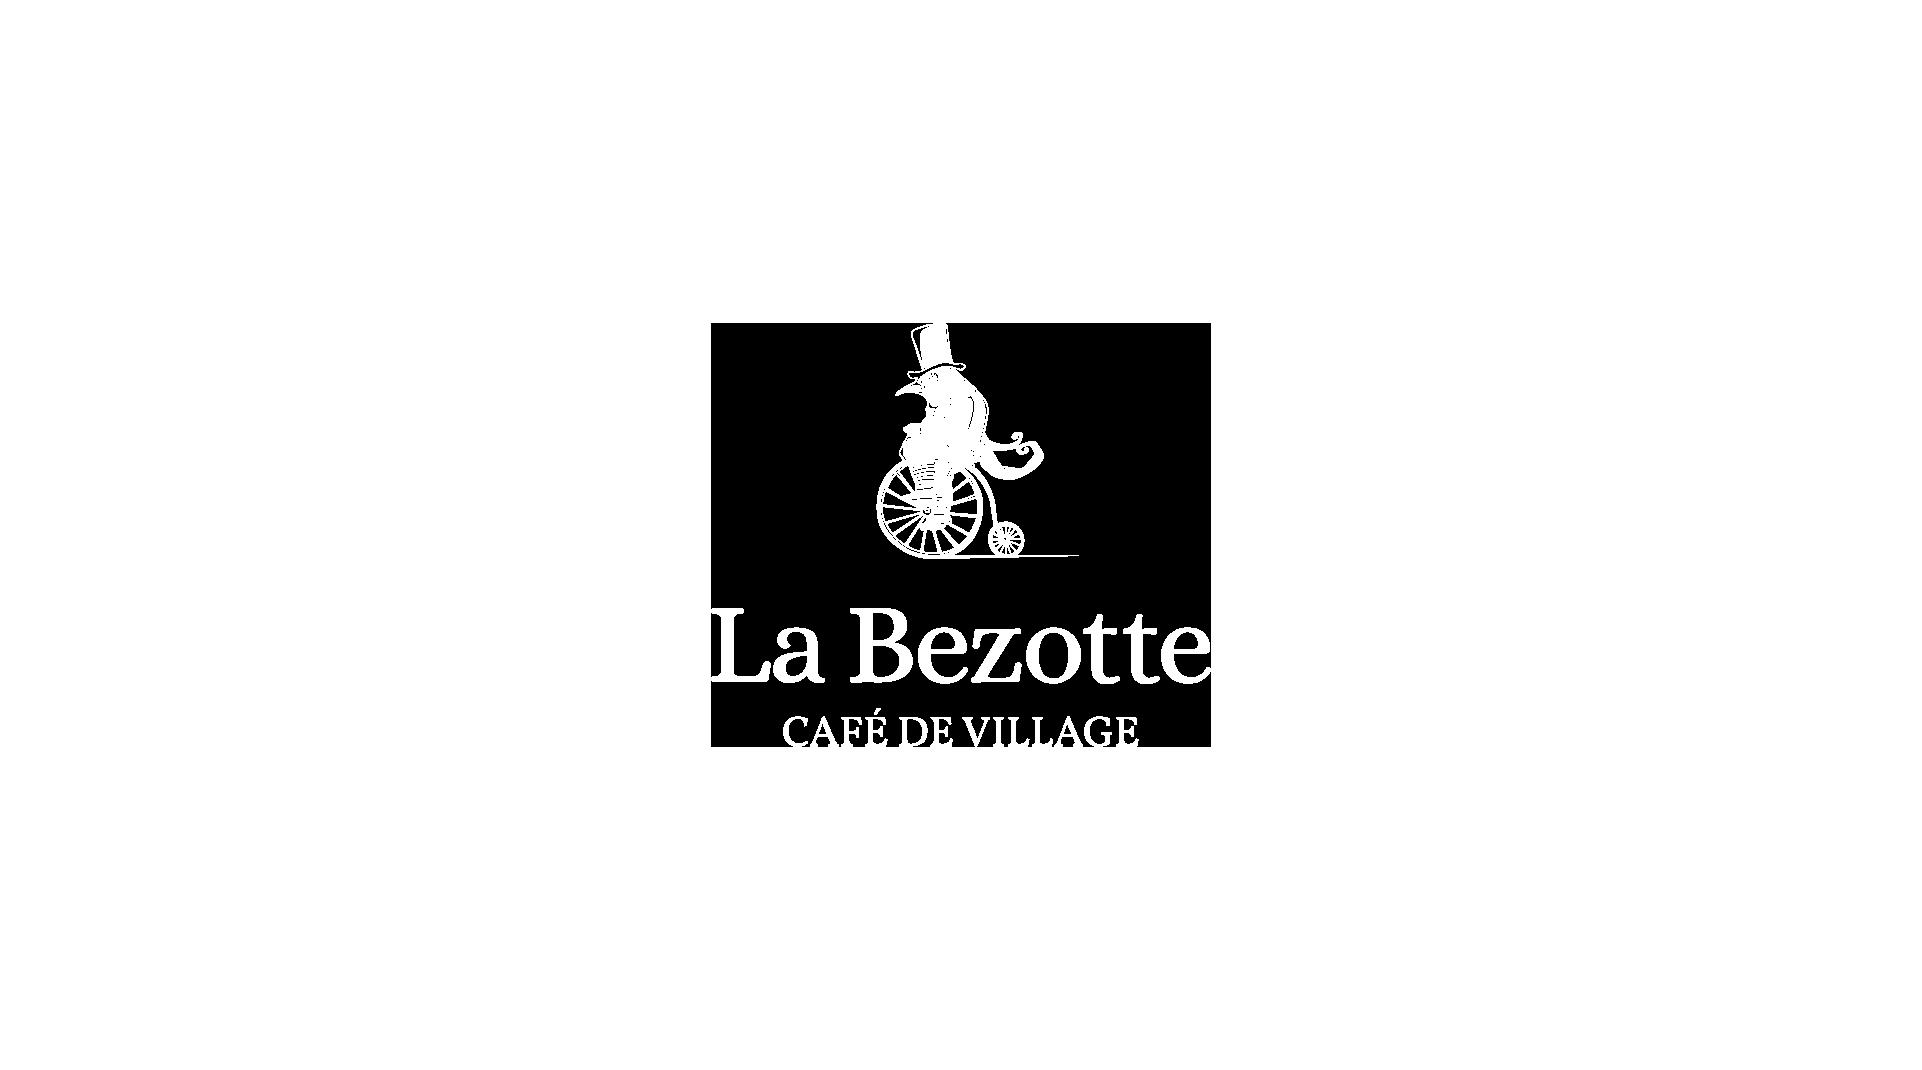 Logo de la Bezotte blanc